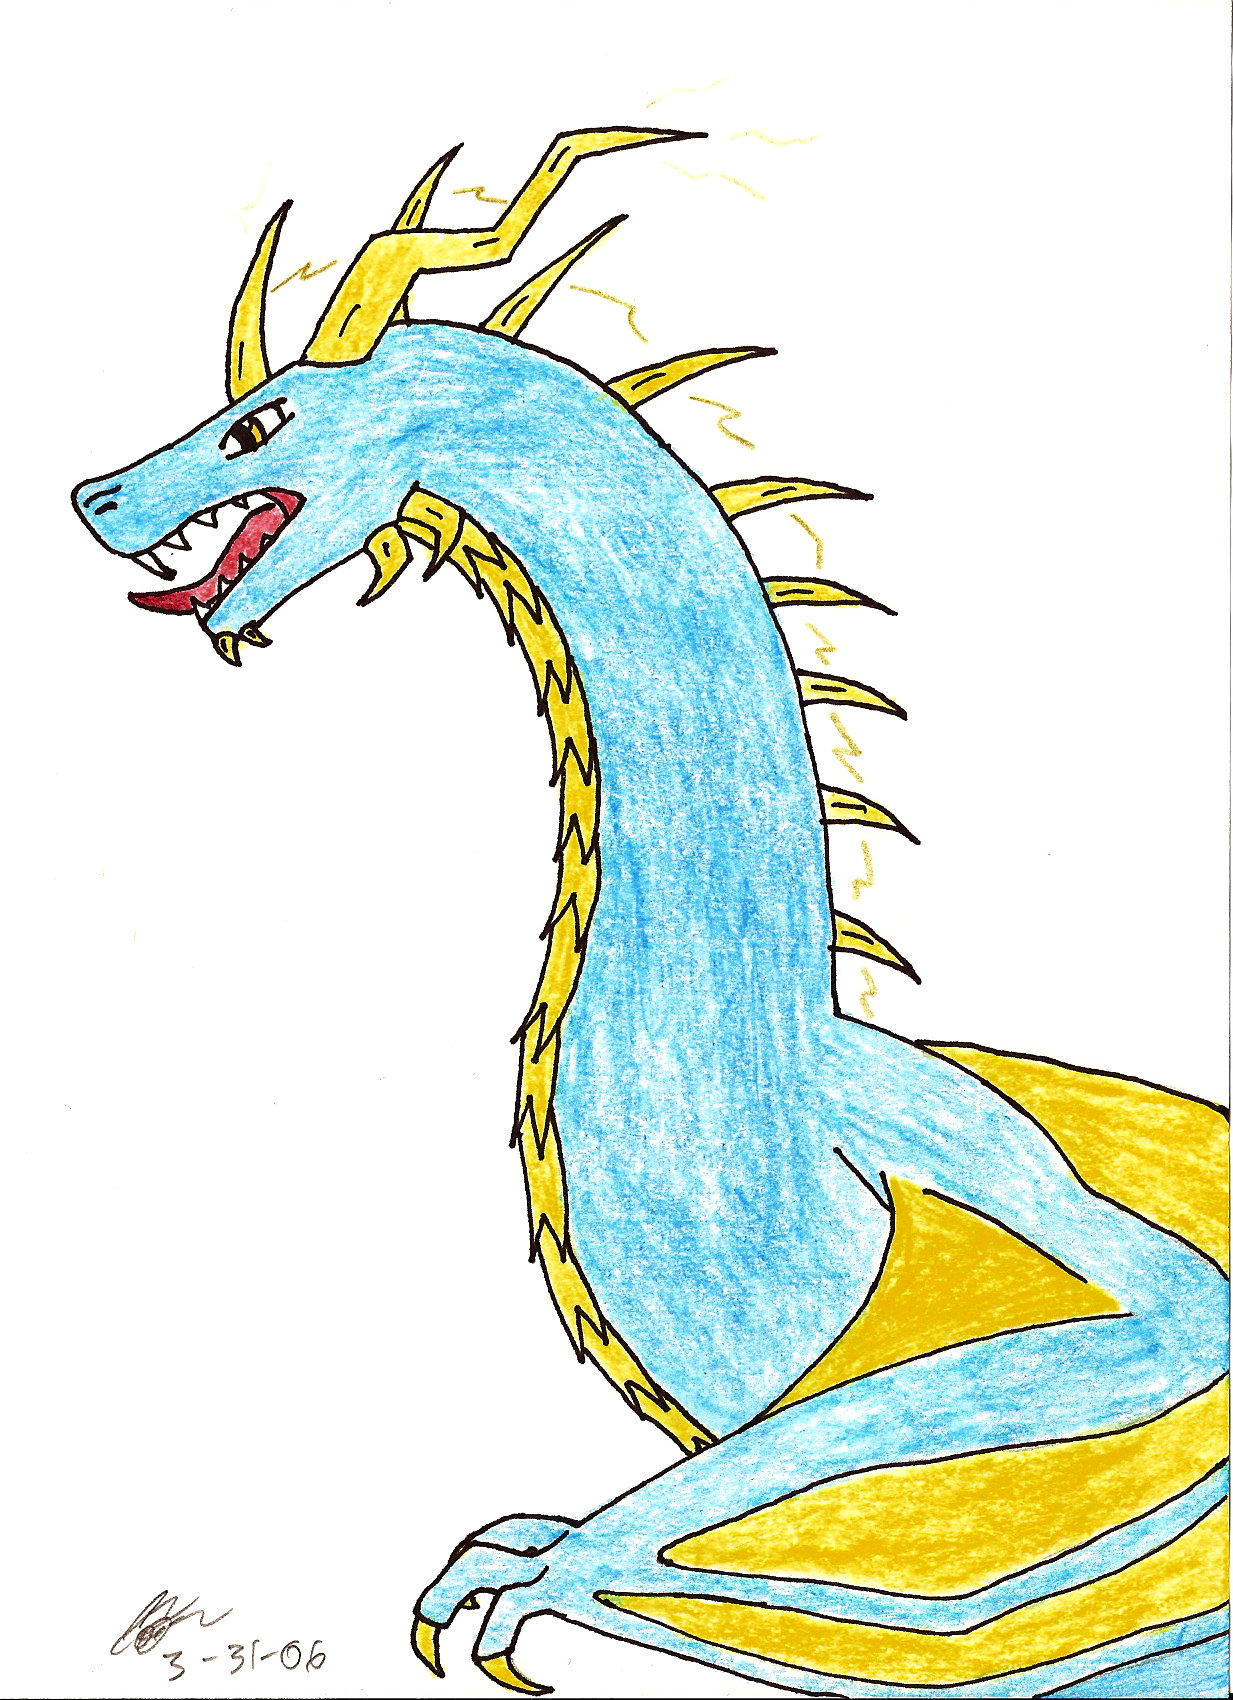 Lightning Dragon by Oliwollyoctosaurus on DeviantArt